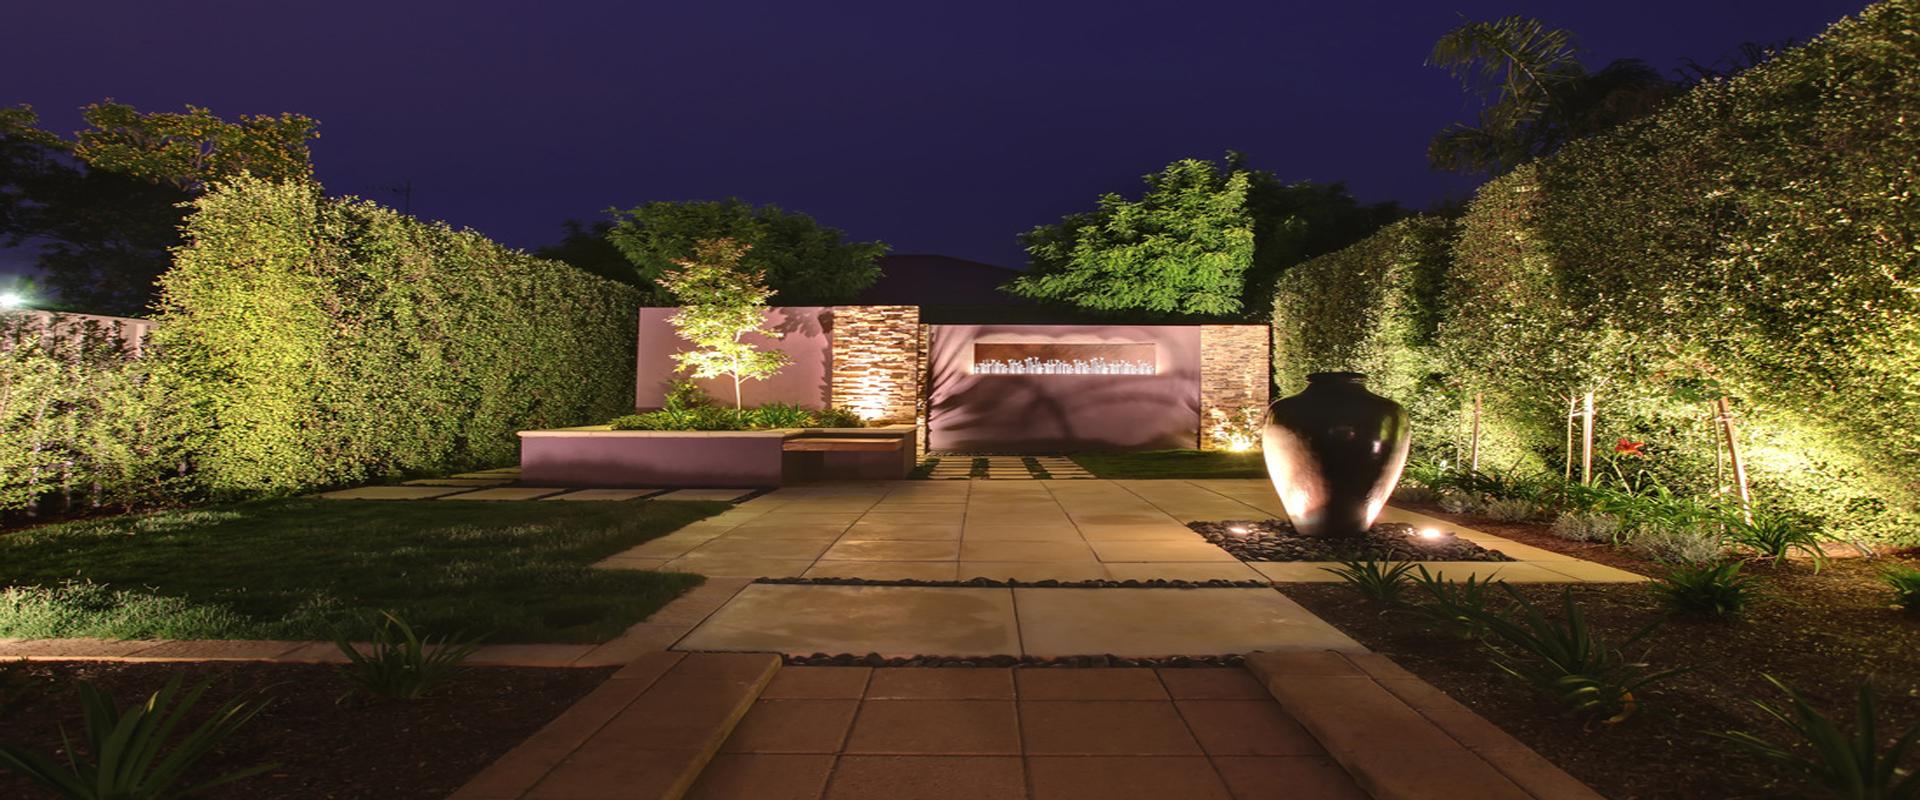 Adelaide landscaping building garden design outdoor for Landscape design jobs adelaide